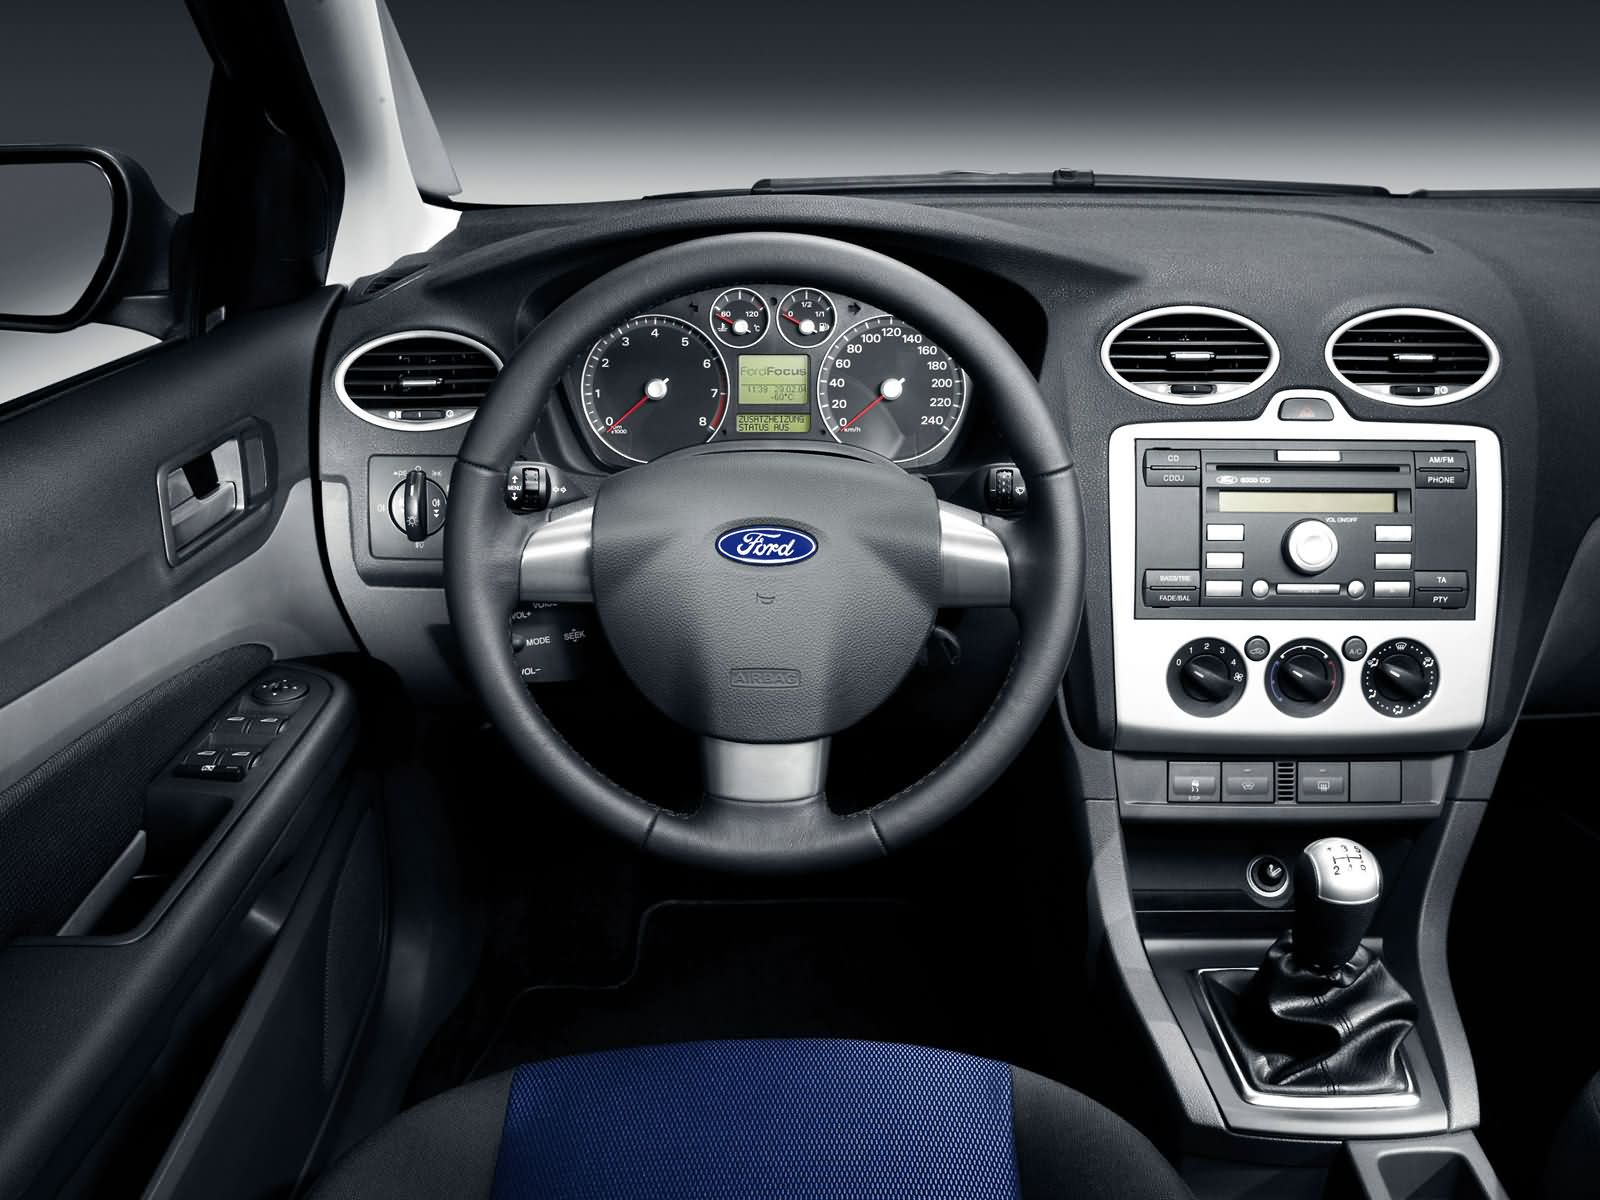 Ford Mondeo 2016, 2 литра, Всем коллегам доброго времени ...